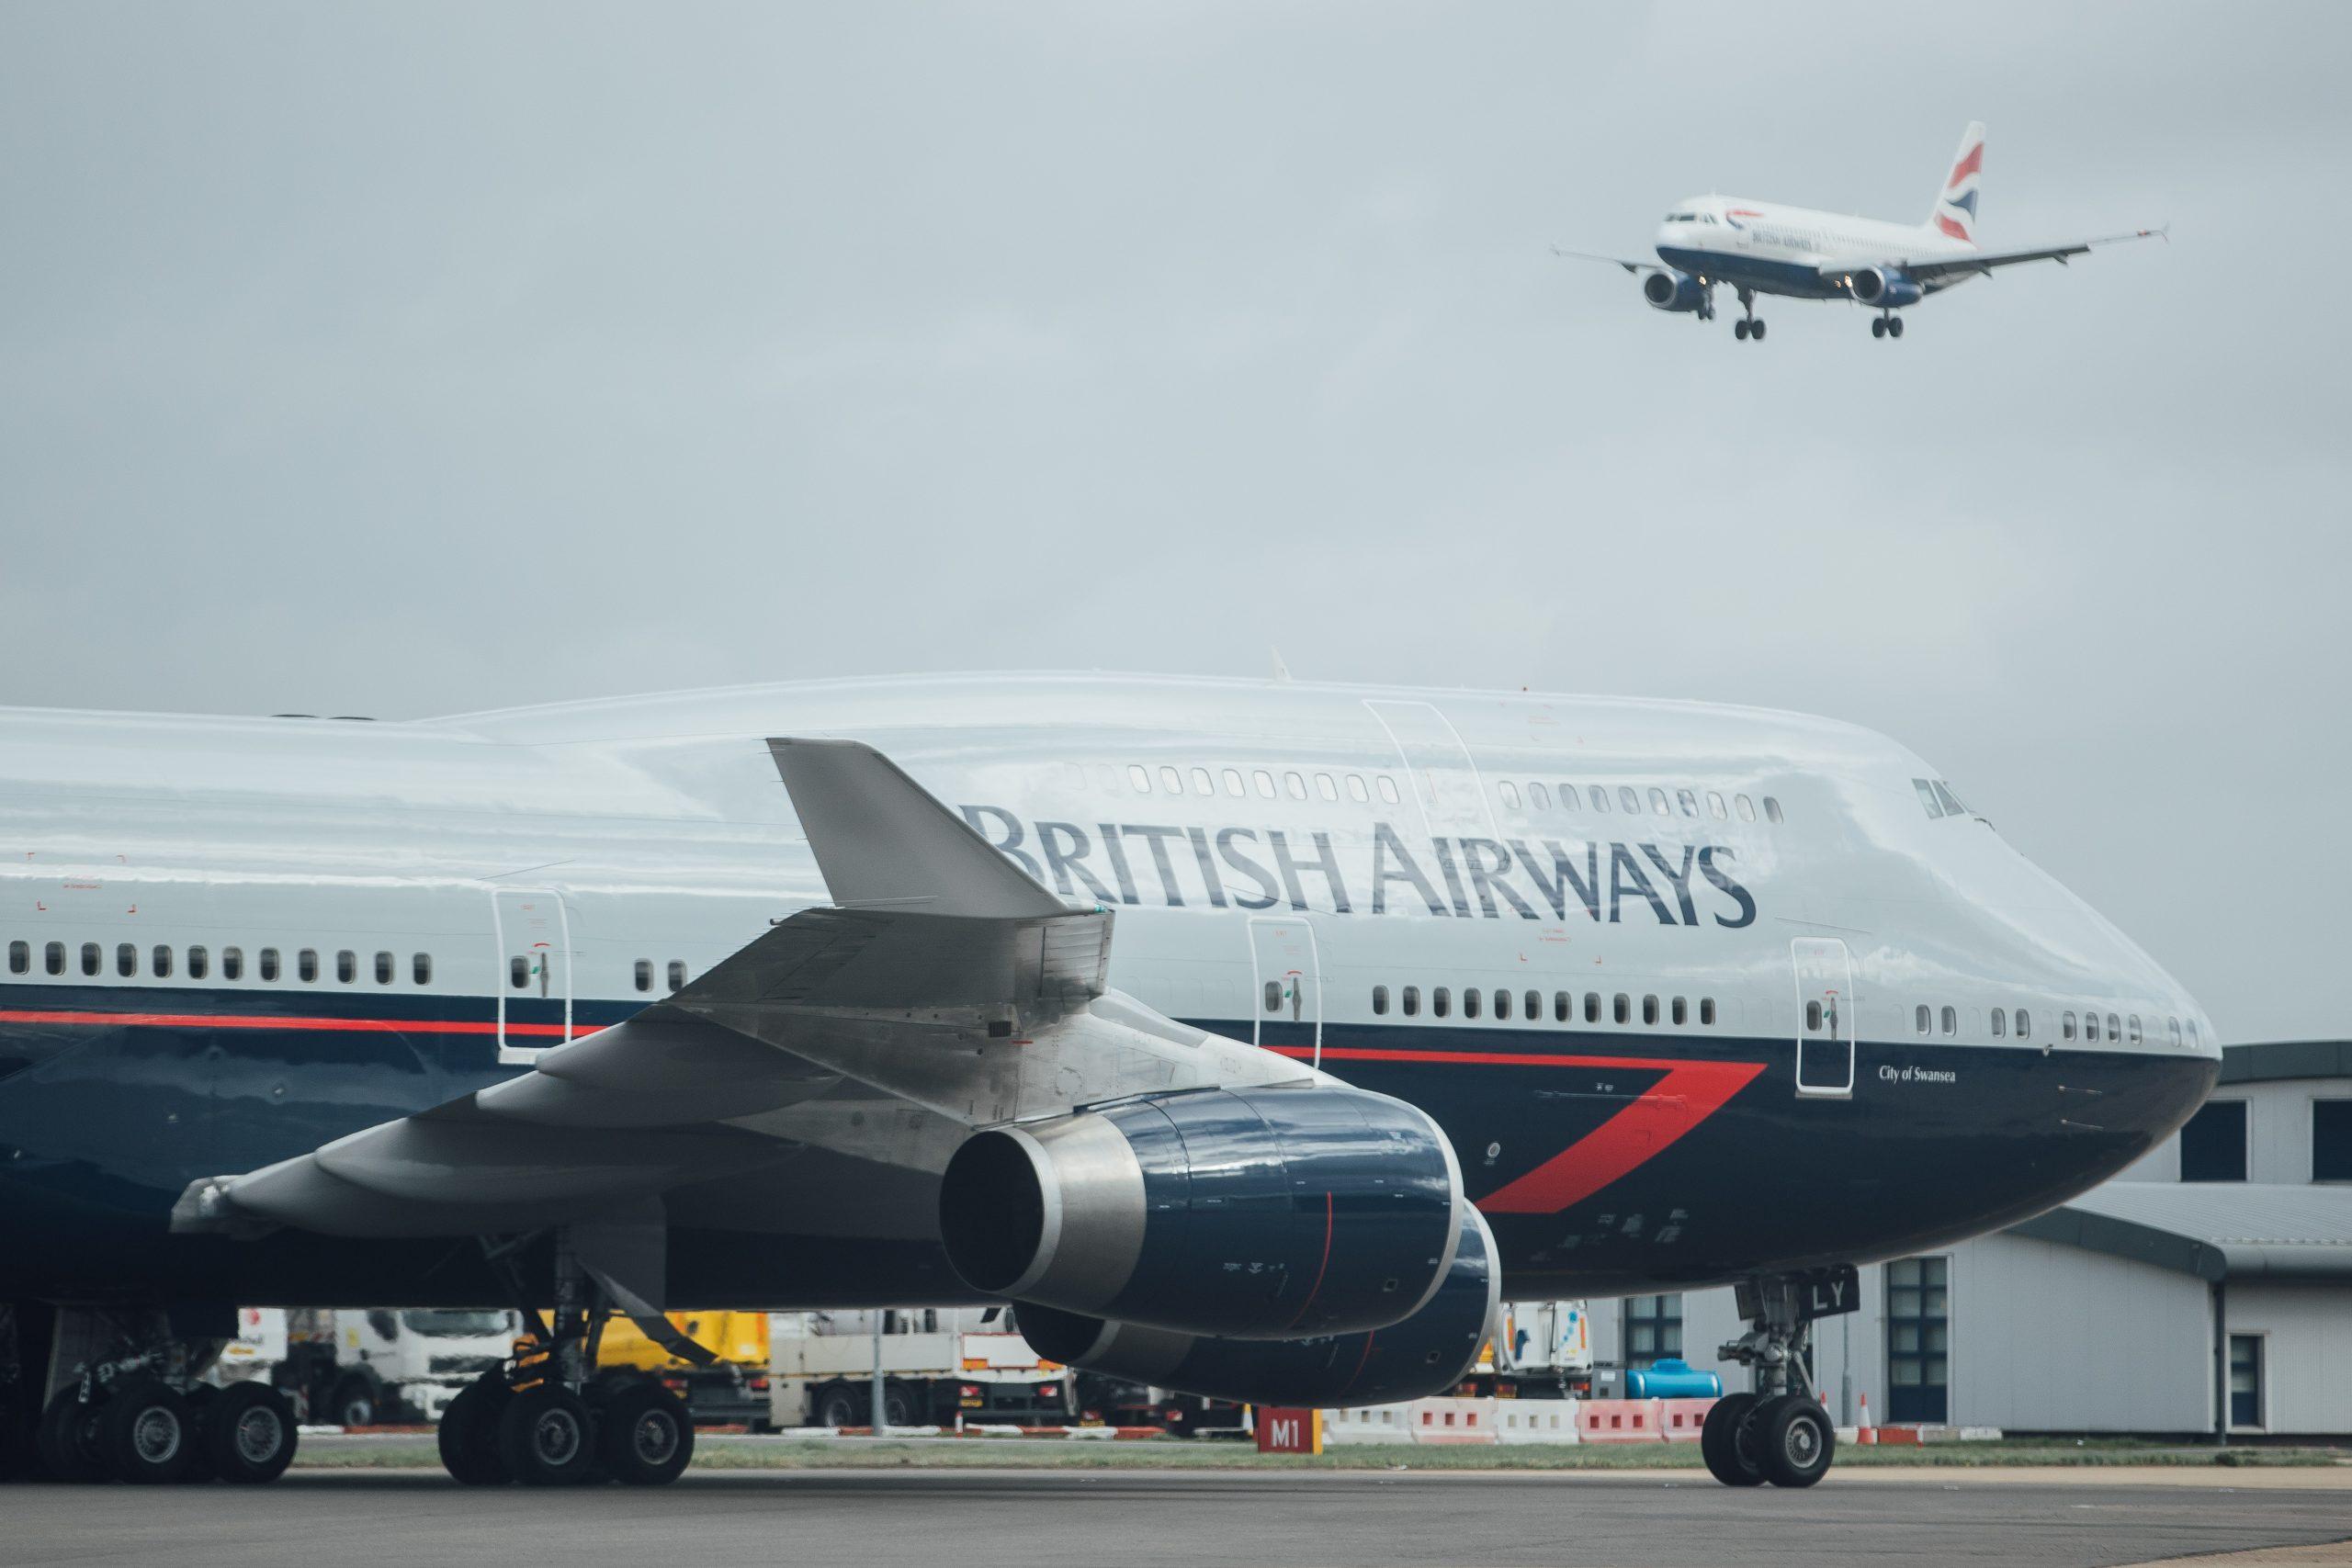 Boeing 747 i det ikoniske Landor-livery. (Foto: Nick Morrish/British Airways)